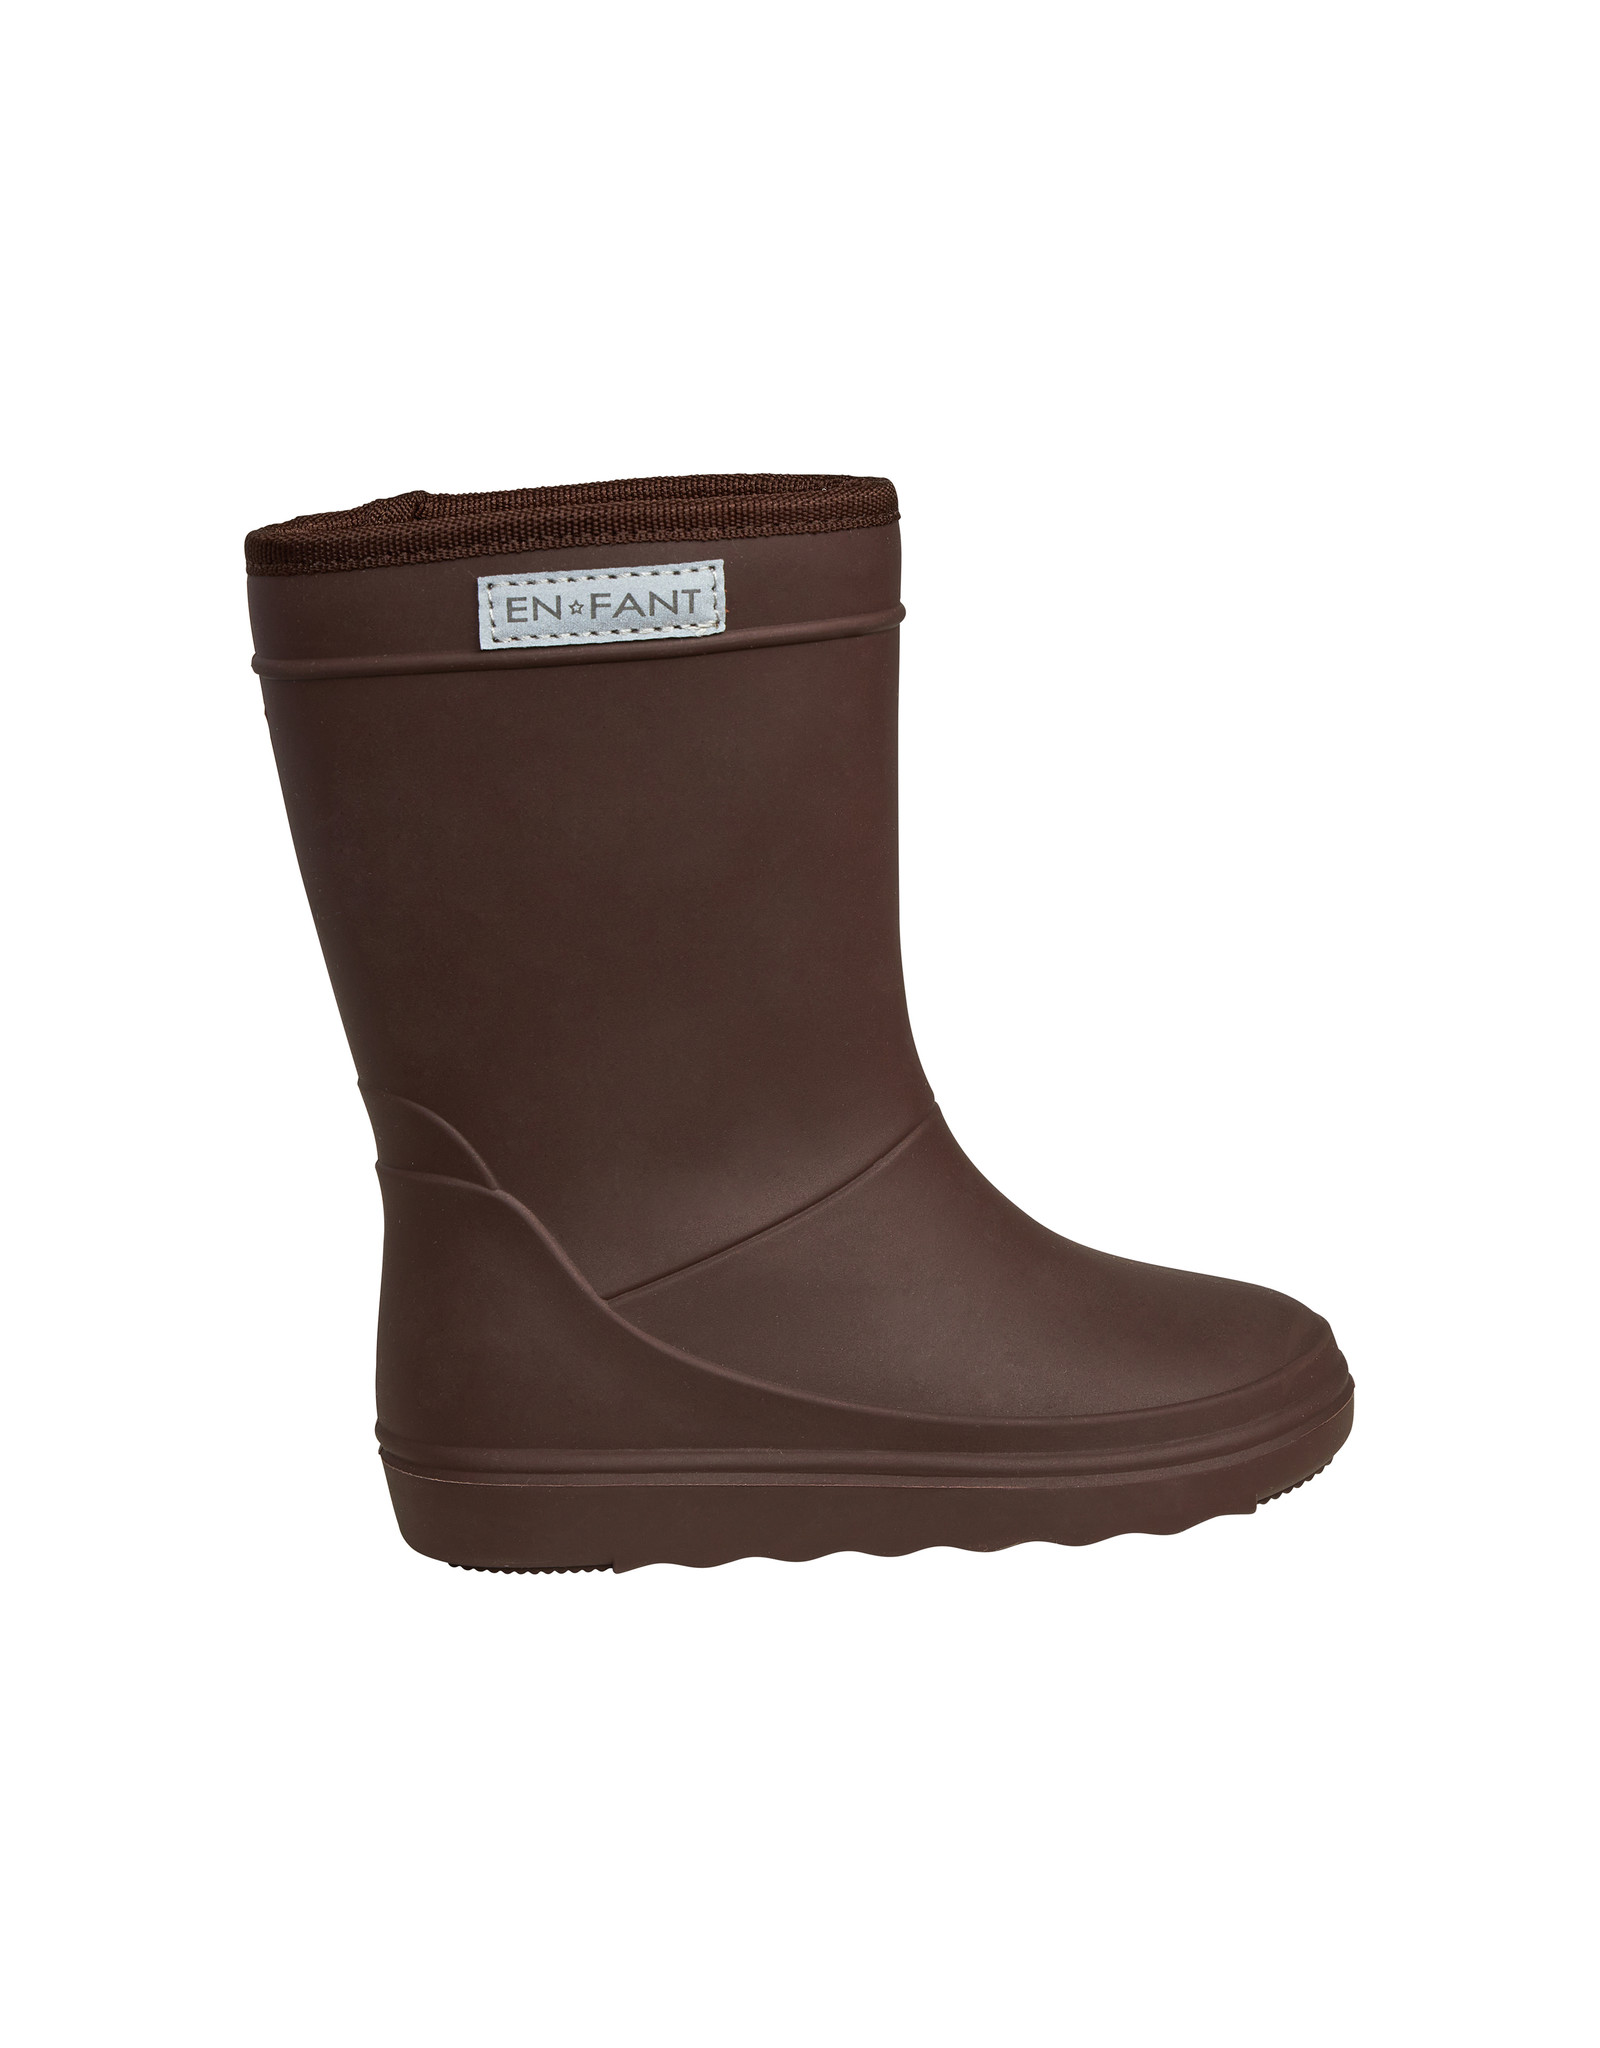 EN FANT En Fant Thermo Boots Solid Dark Brown